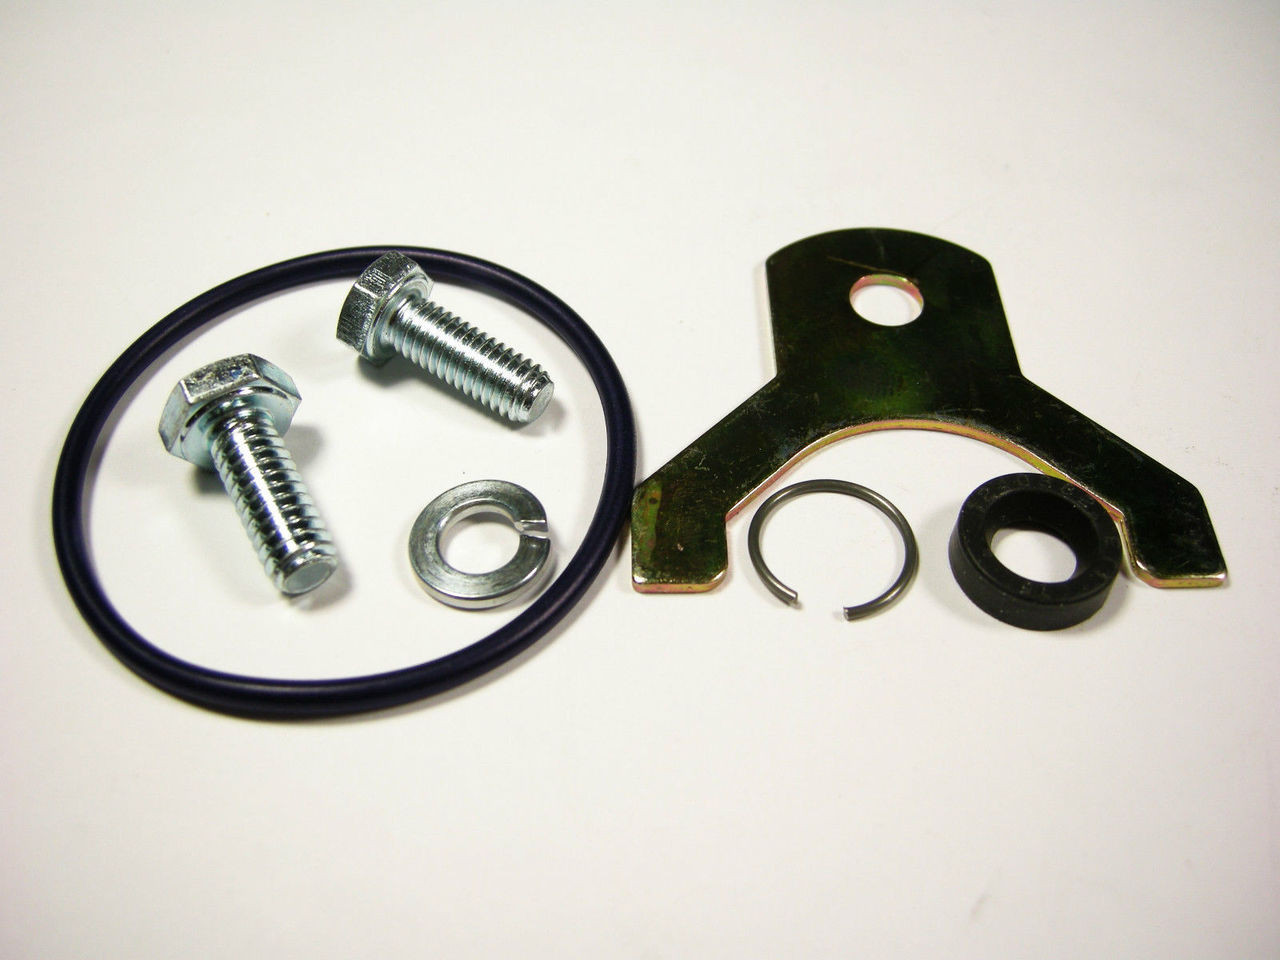 700R4 COMPLETE Speedo Gear Housing LEAK STOP SEAL KIT Transmission Speedometer